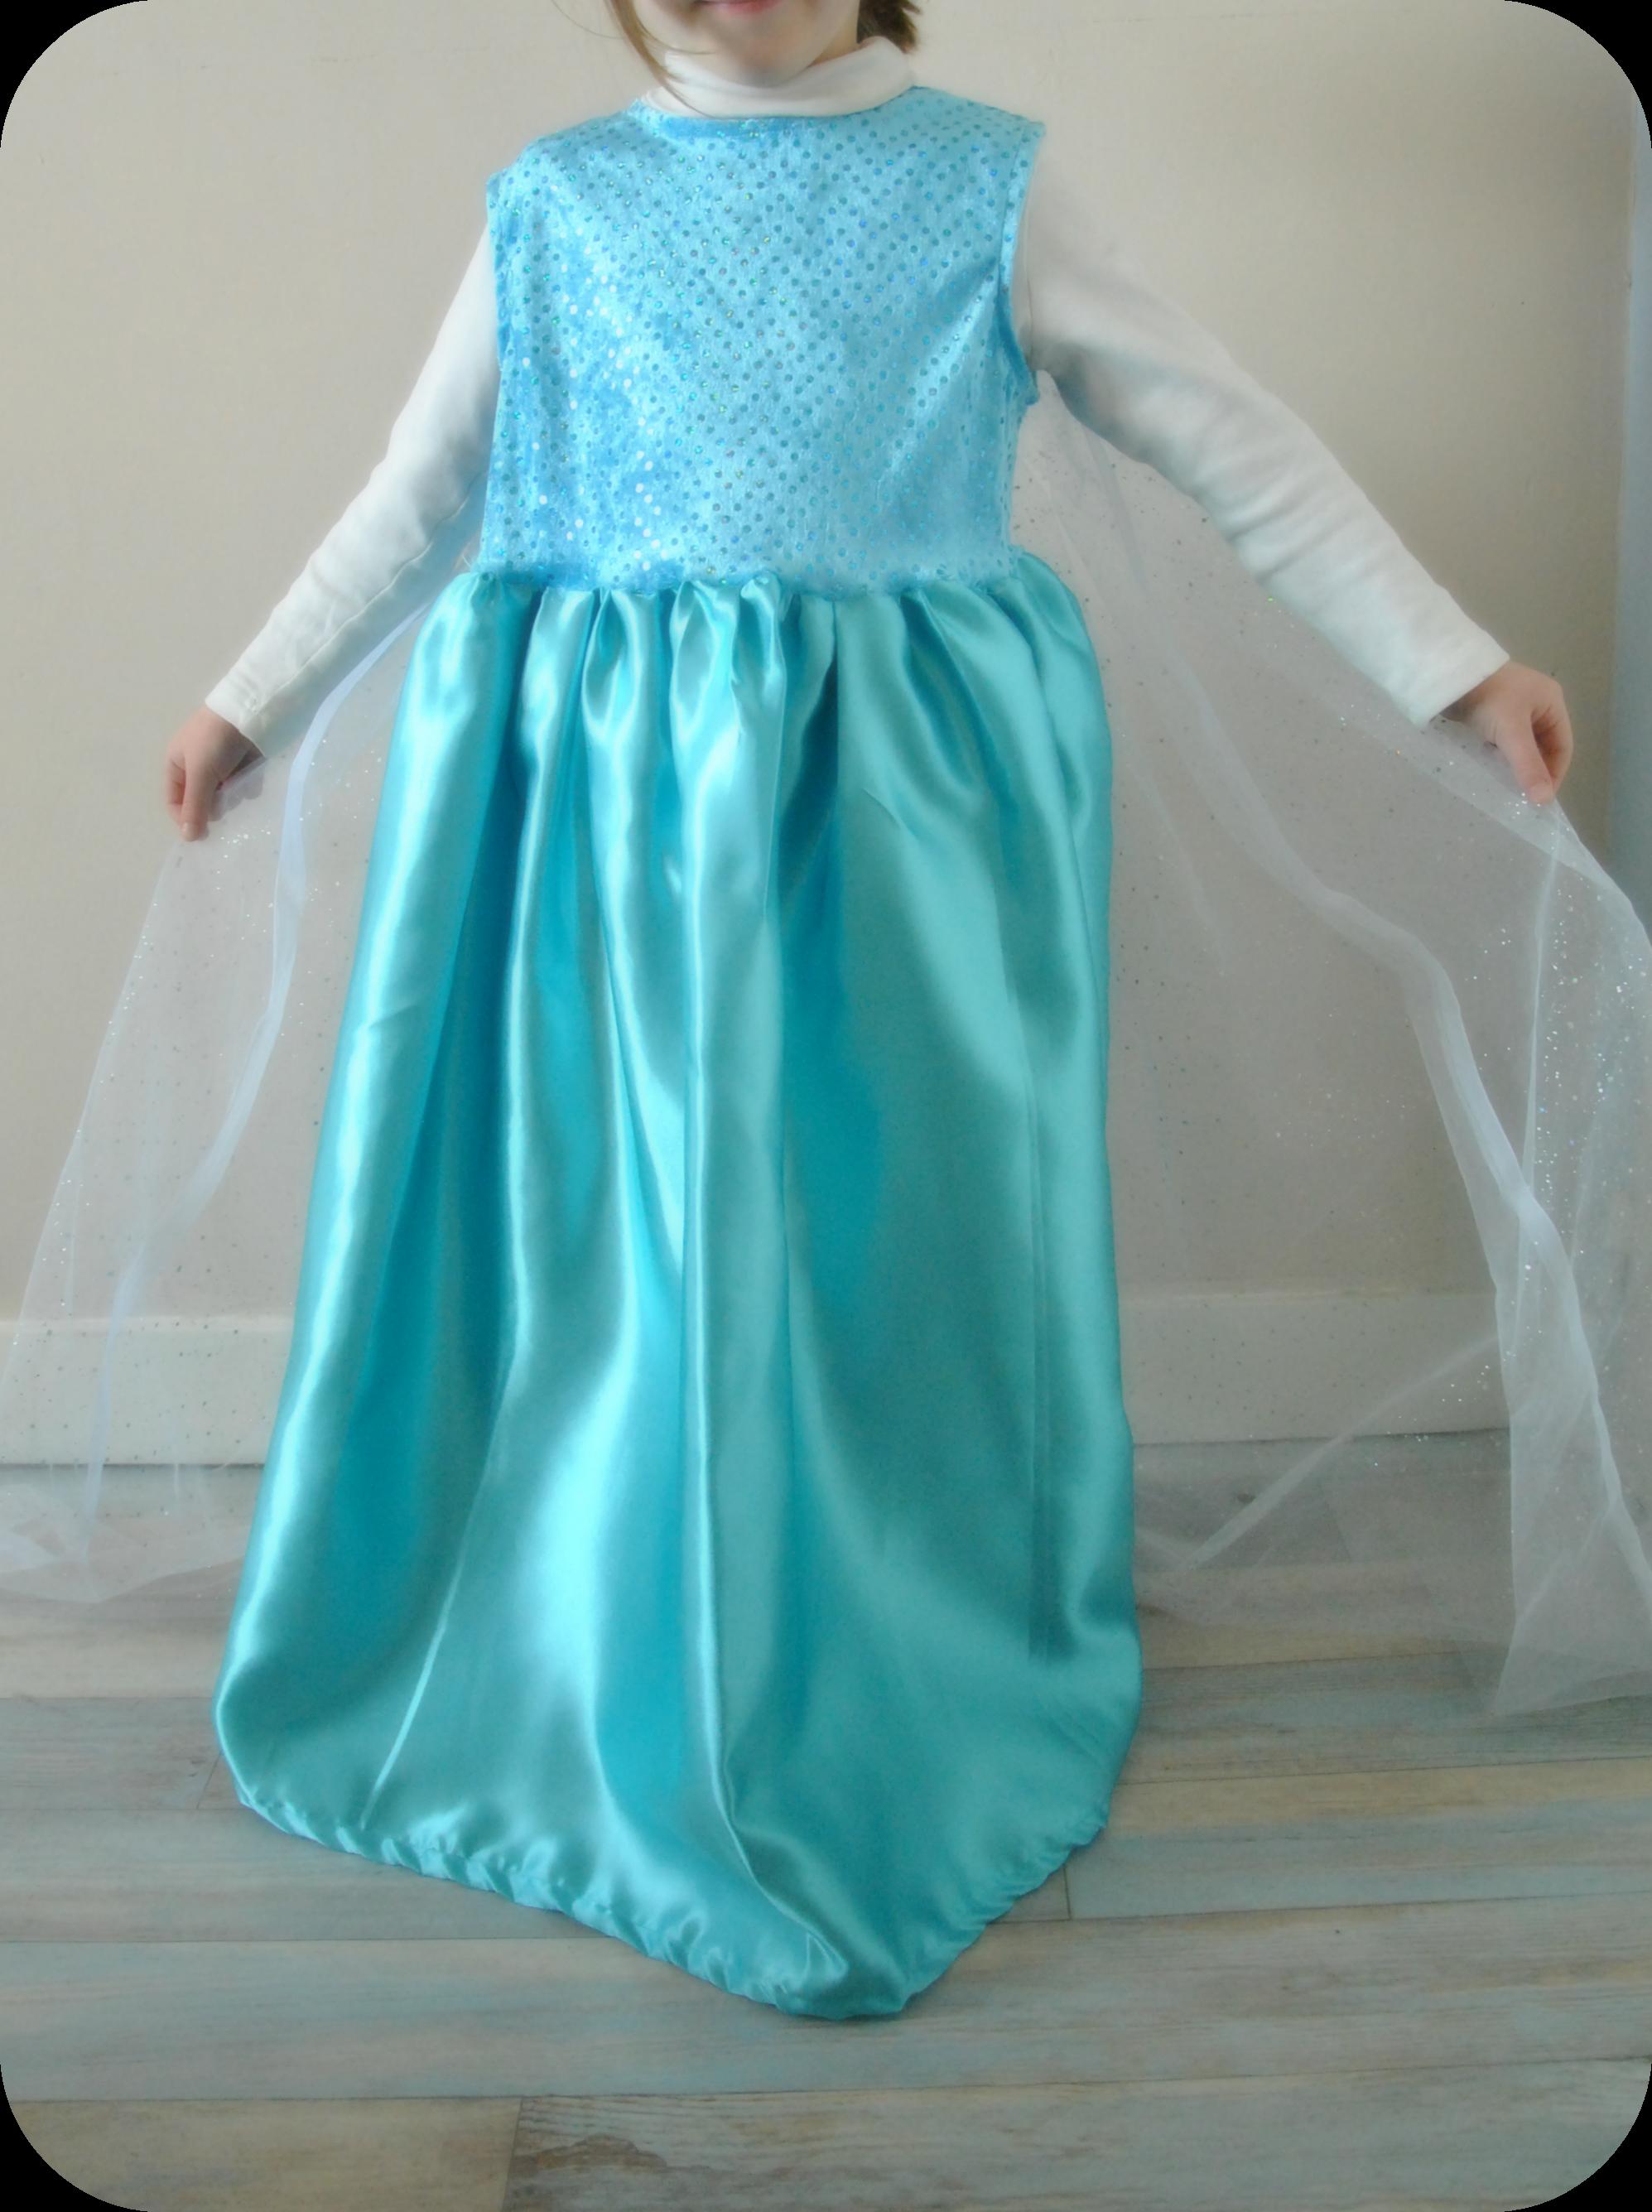 Couture enfant mademoiselle lu - Robe reine de neige ...